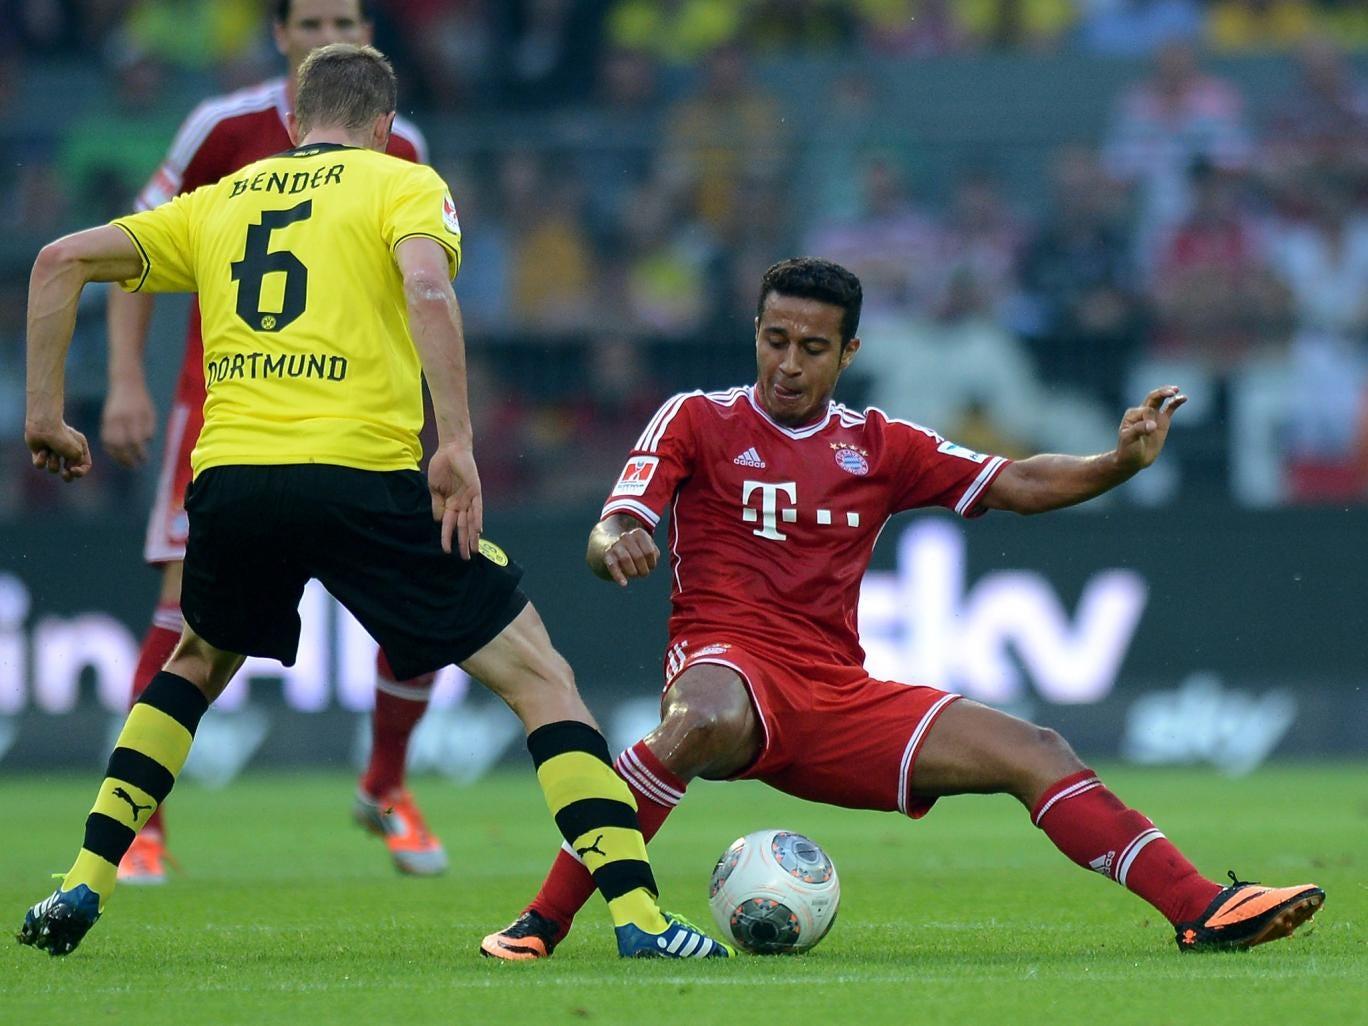 Thiago Alcantara (r) challenges Sven Bender (l) during the 2013 German Super Cup